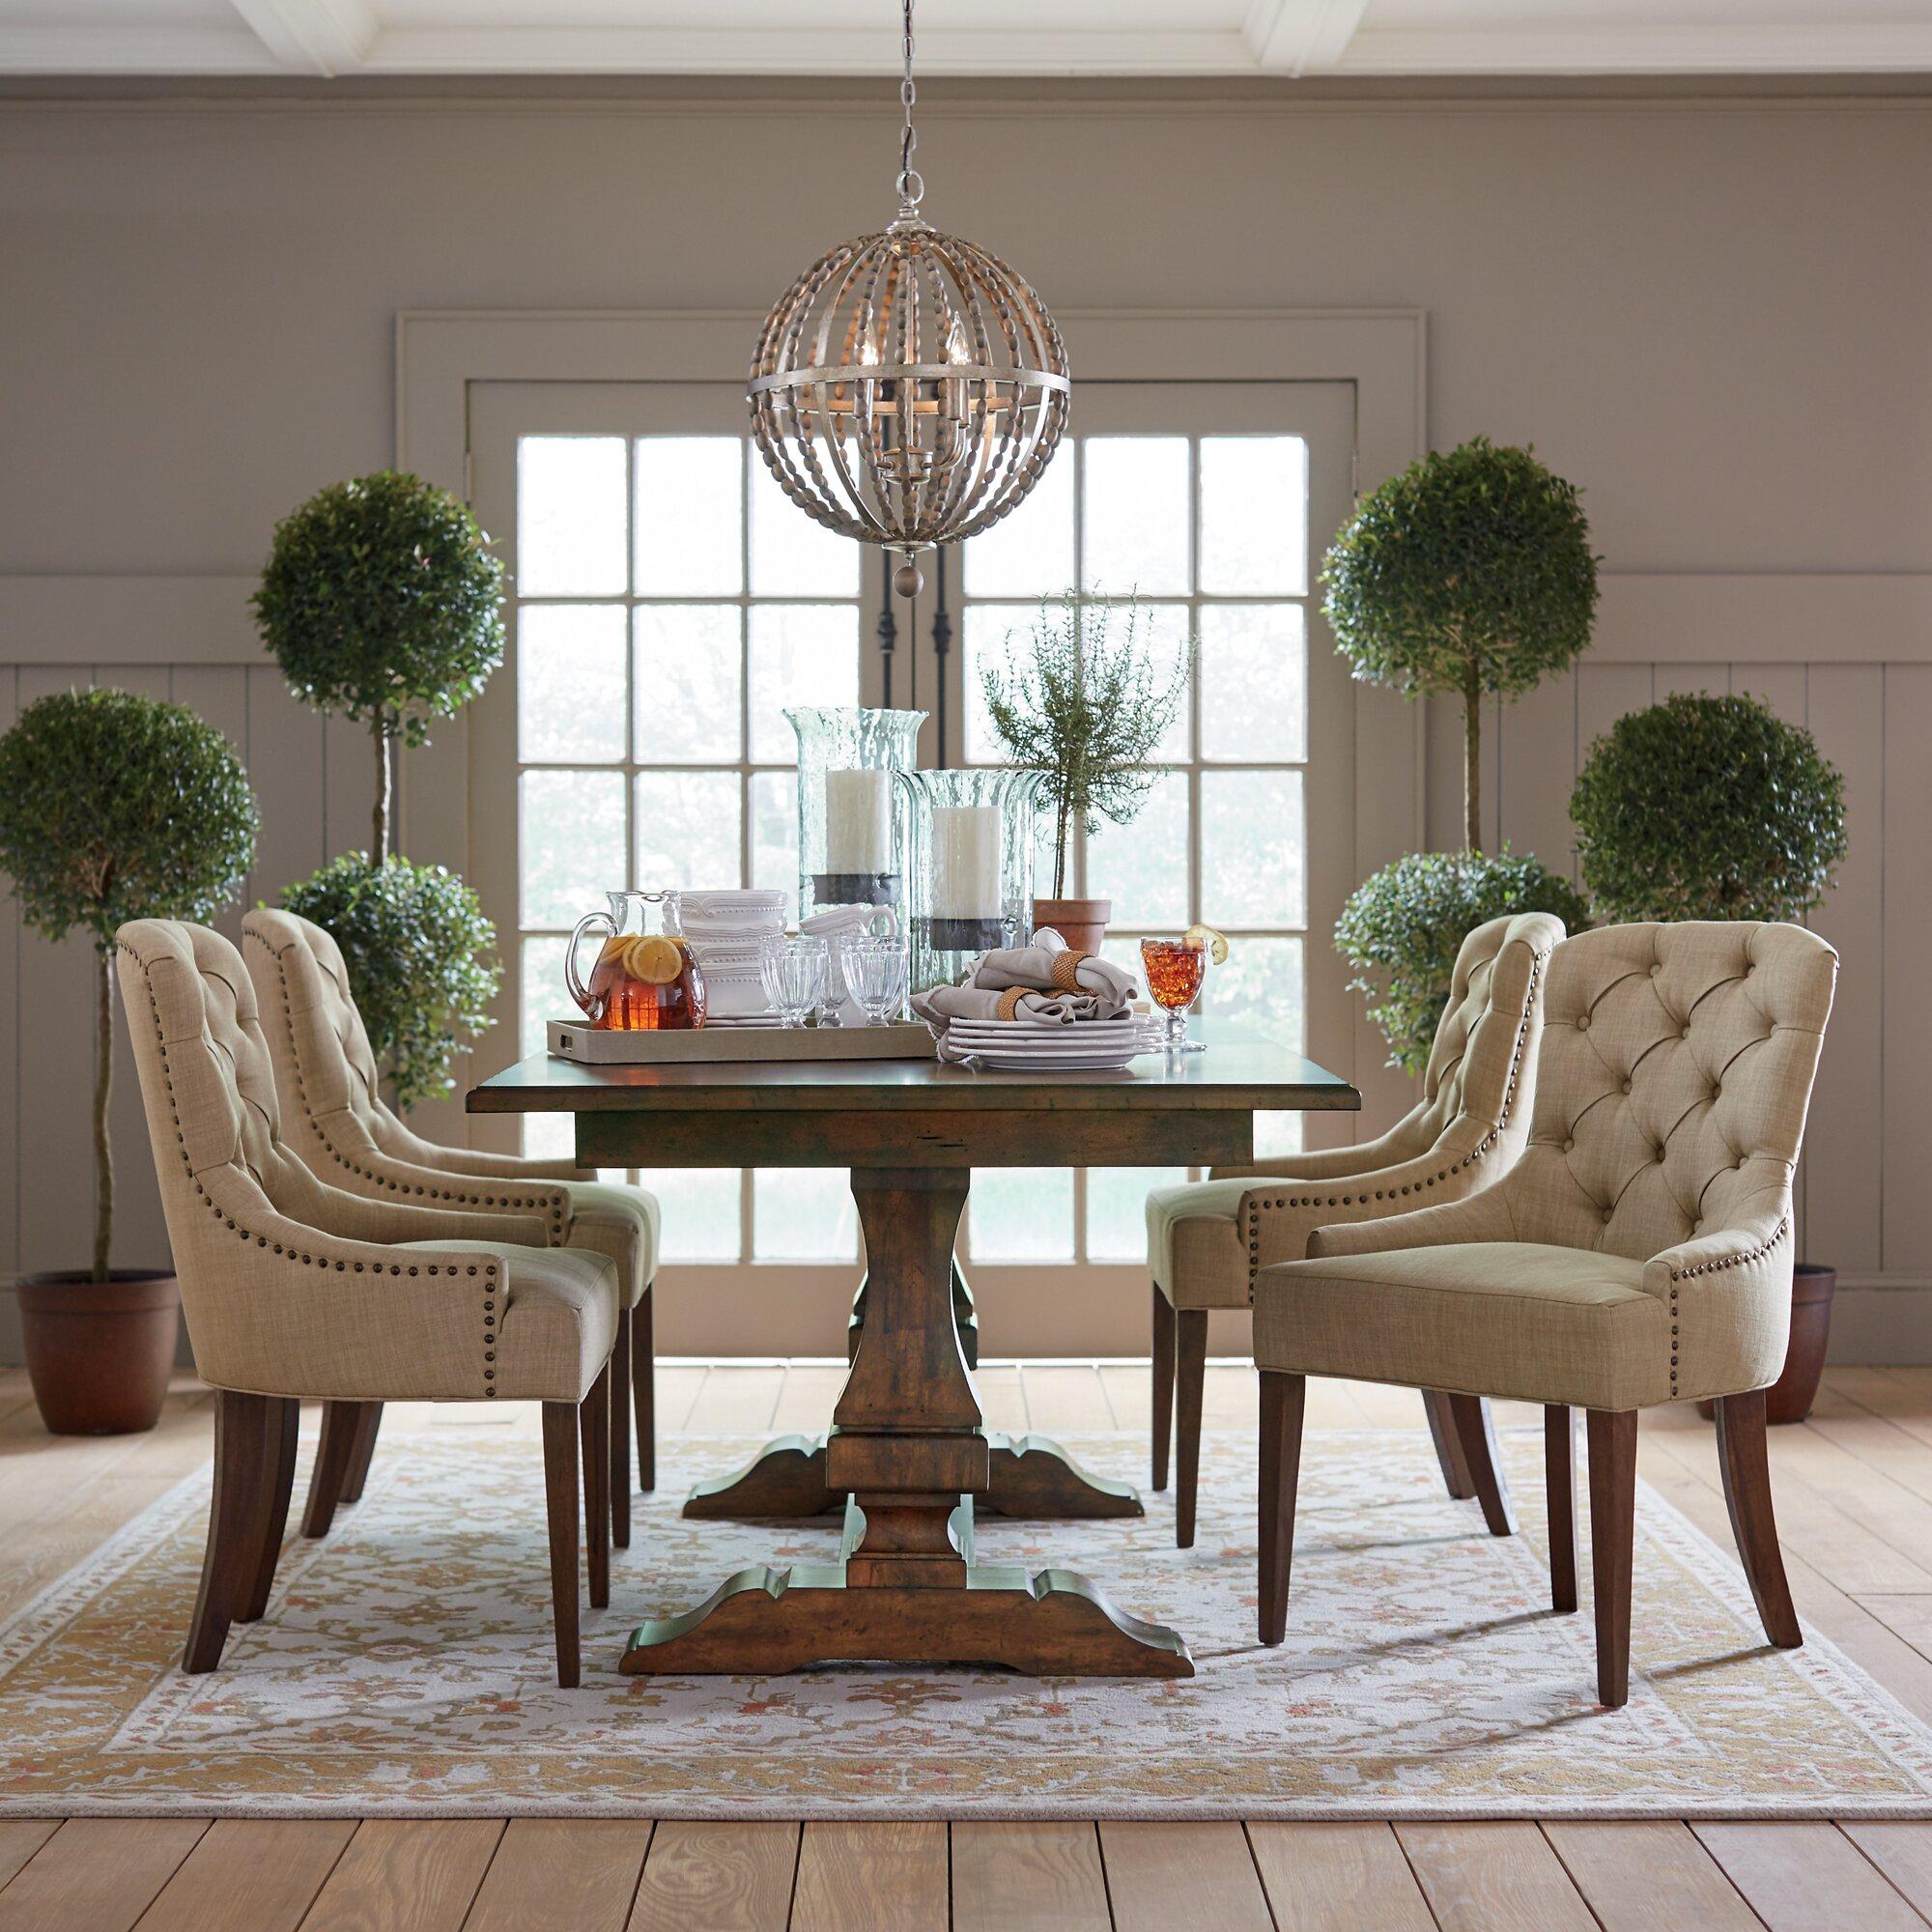 Birch Lane Schaffer Dining Table | Birch Lane